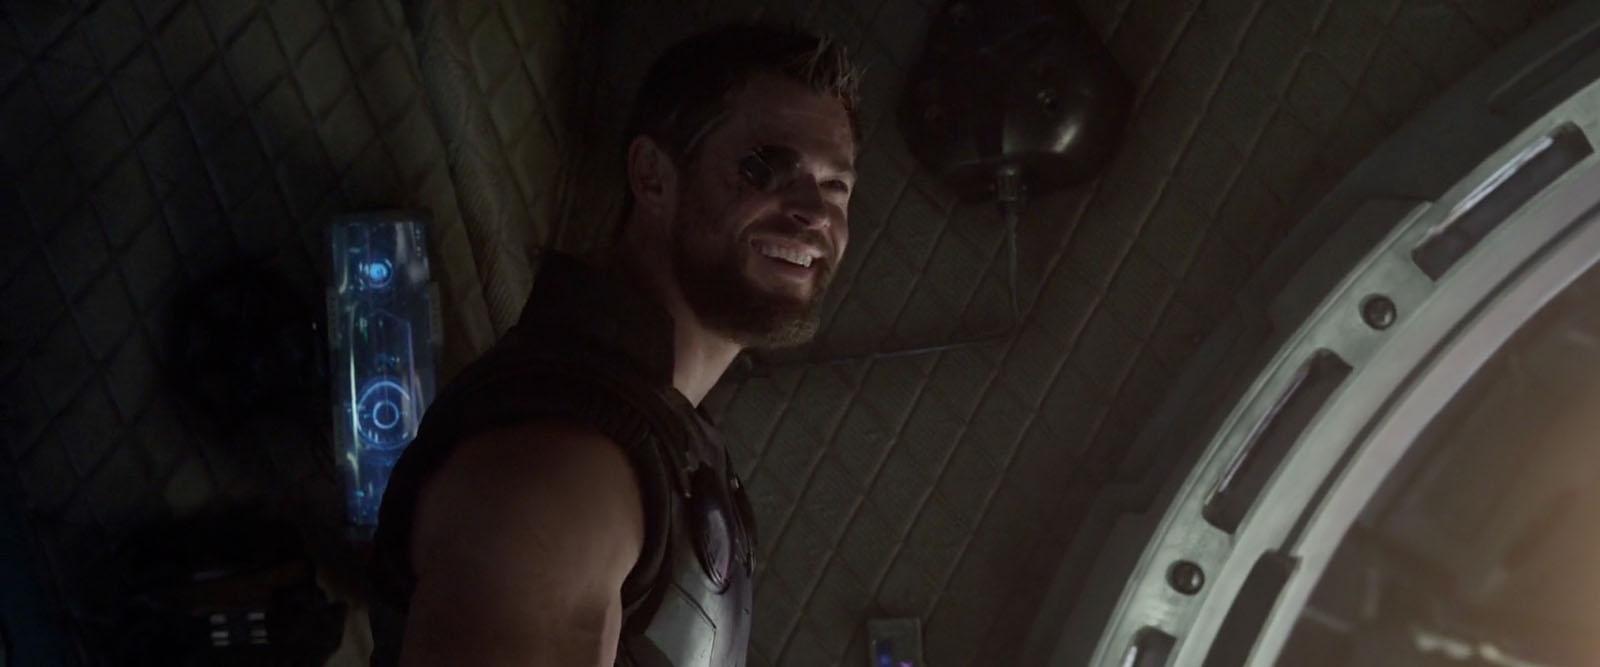 Avengers_IW_Screens_TerritoryStudio_007.jpg